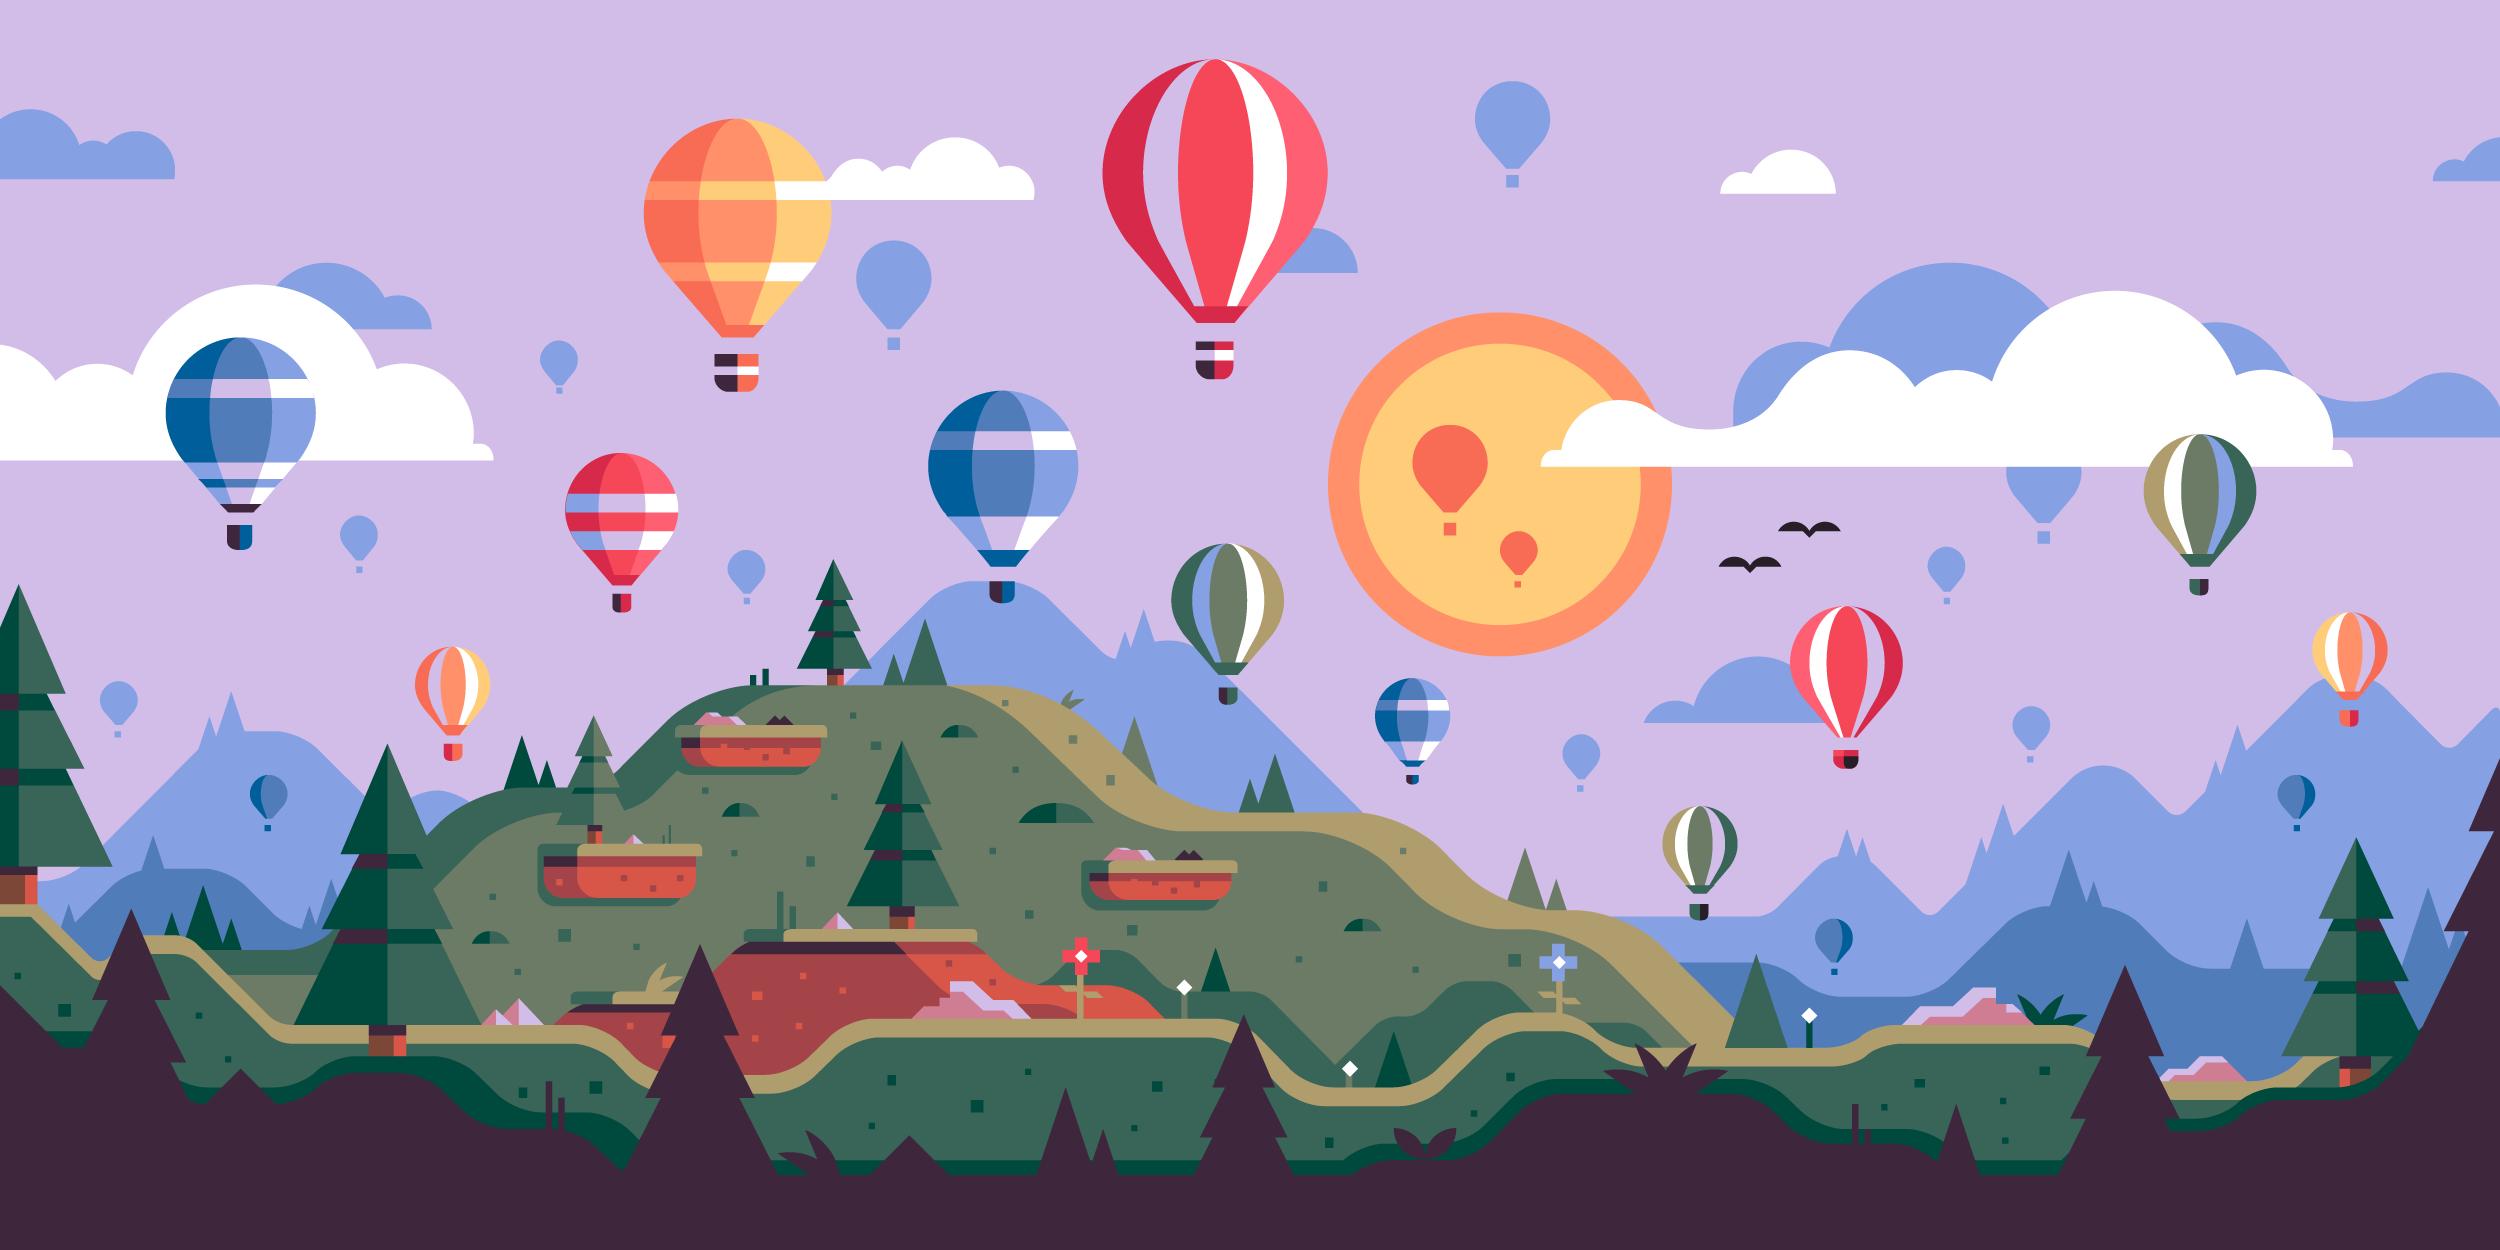 Hot air balloon landscape scene. Illustration by Matt Anderson.